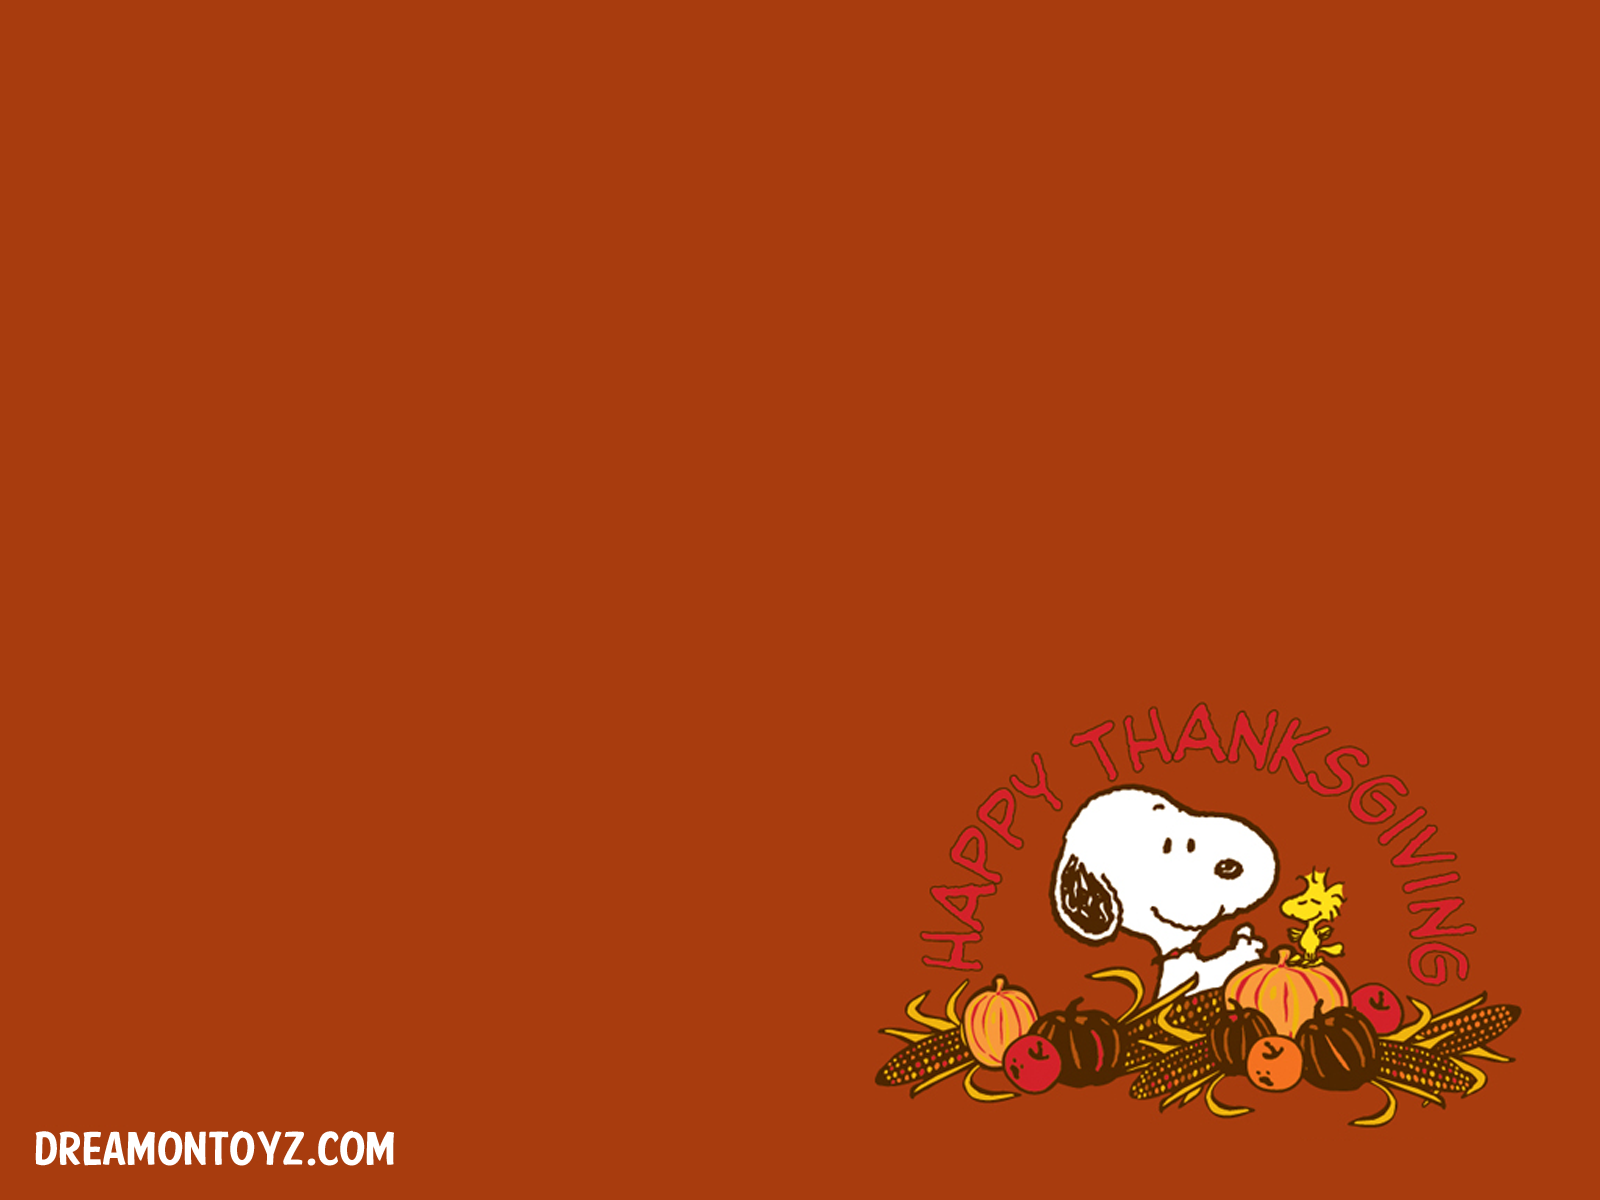 FREE Cartoon Graphics Pics Gifs Photographs Peanuts 1600x1200